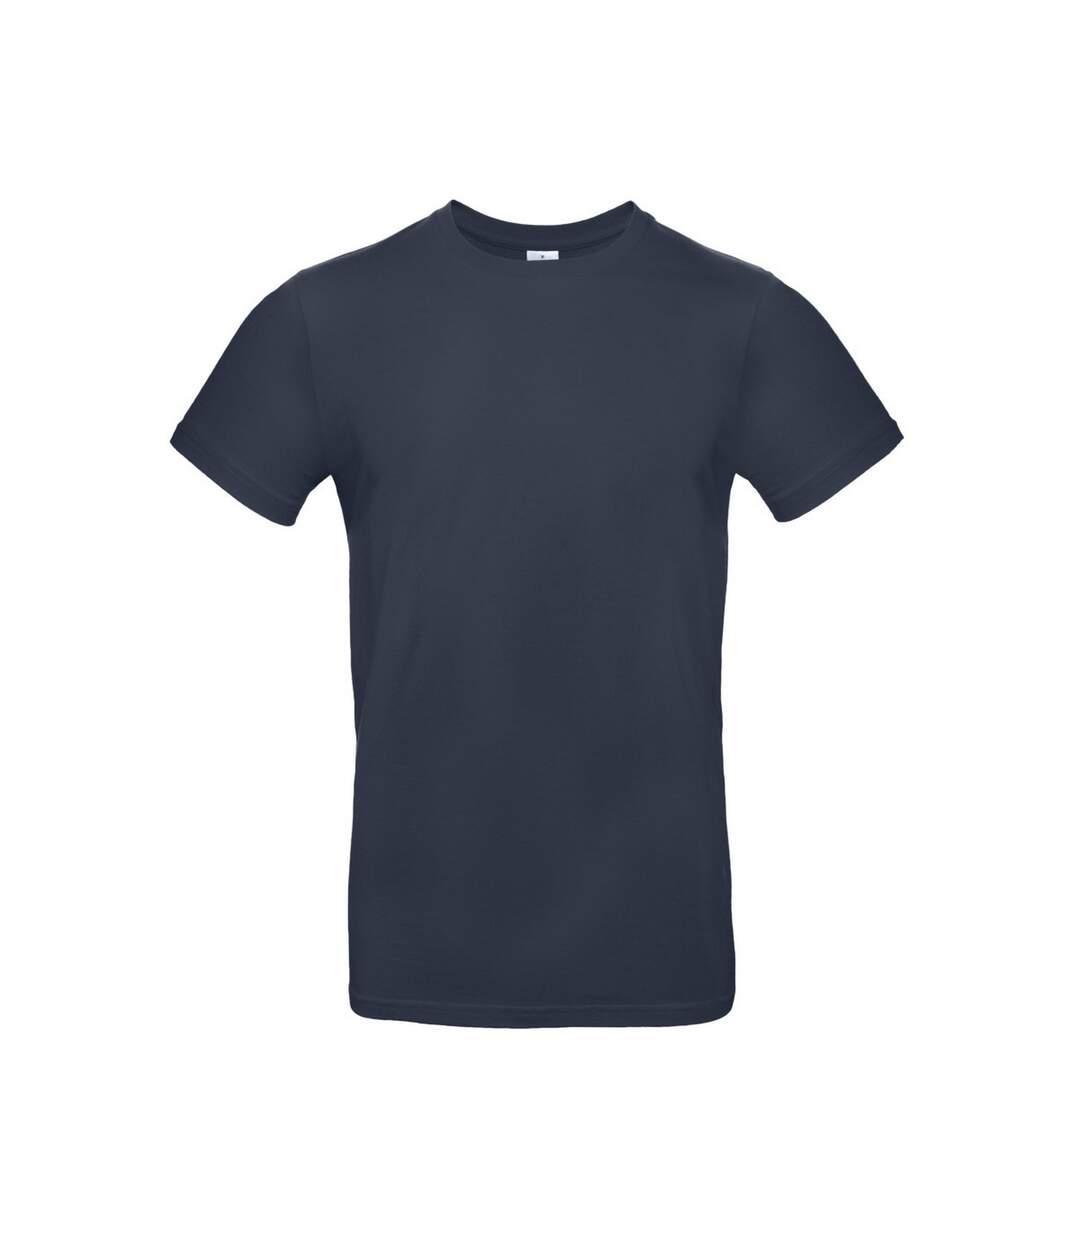 B&C Mens #E190 Tee (Navy Blue) - UTBC3911